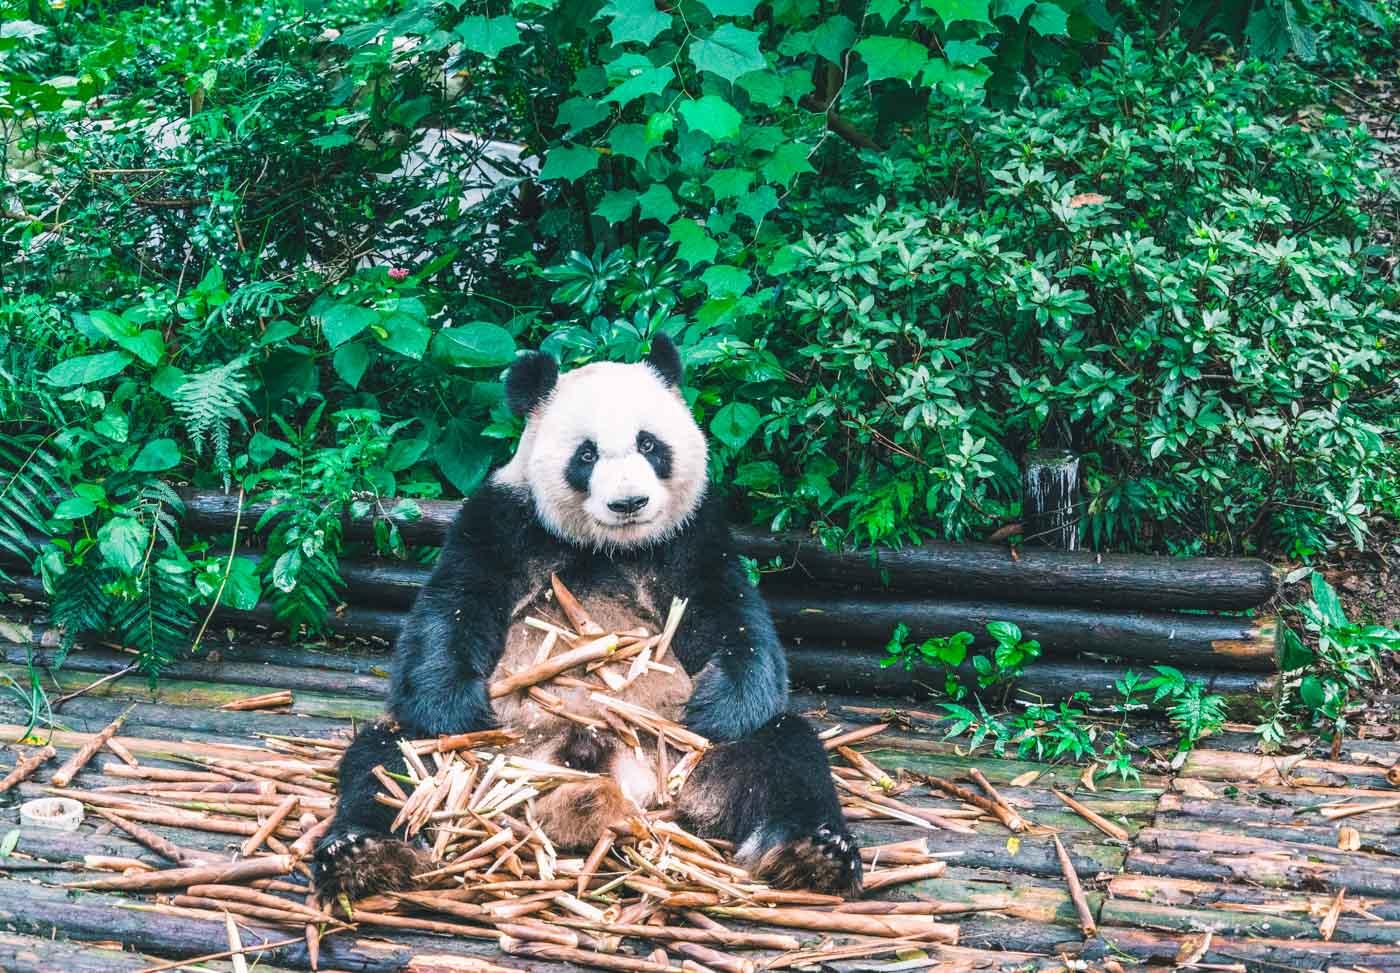 Panda at the Panda Research Centre in Chengdu